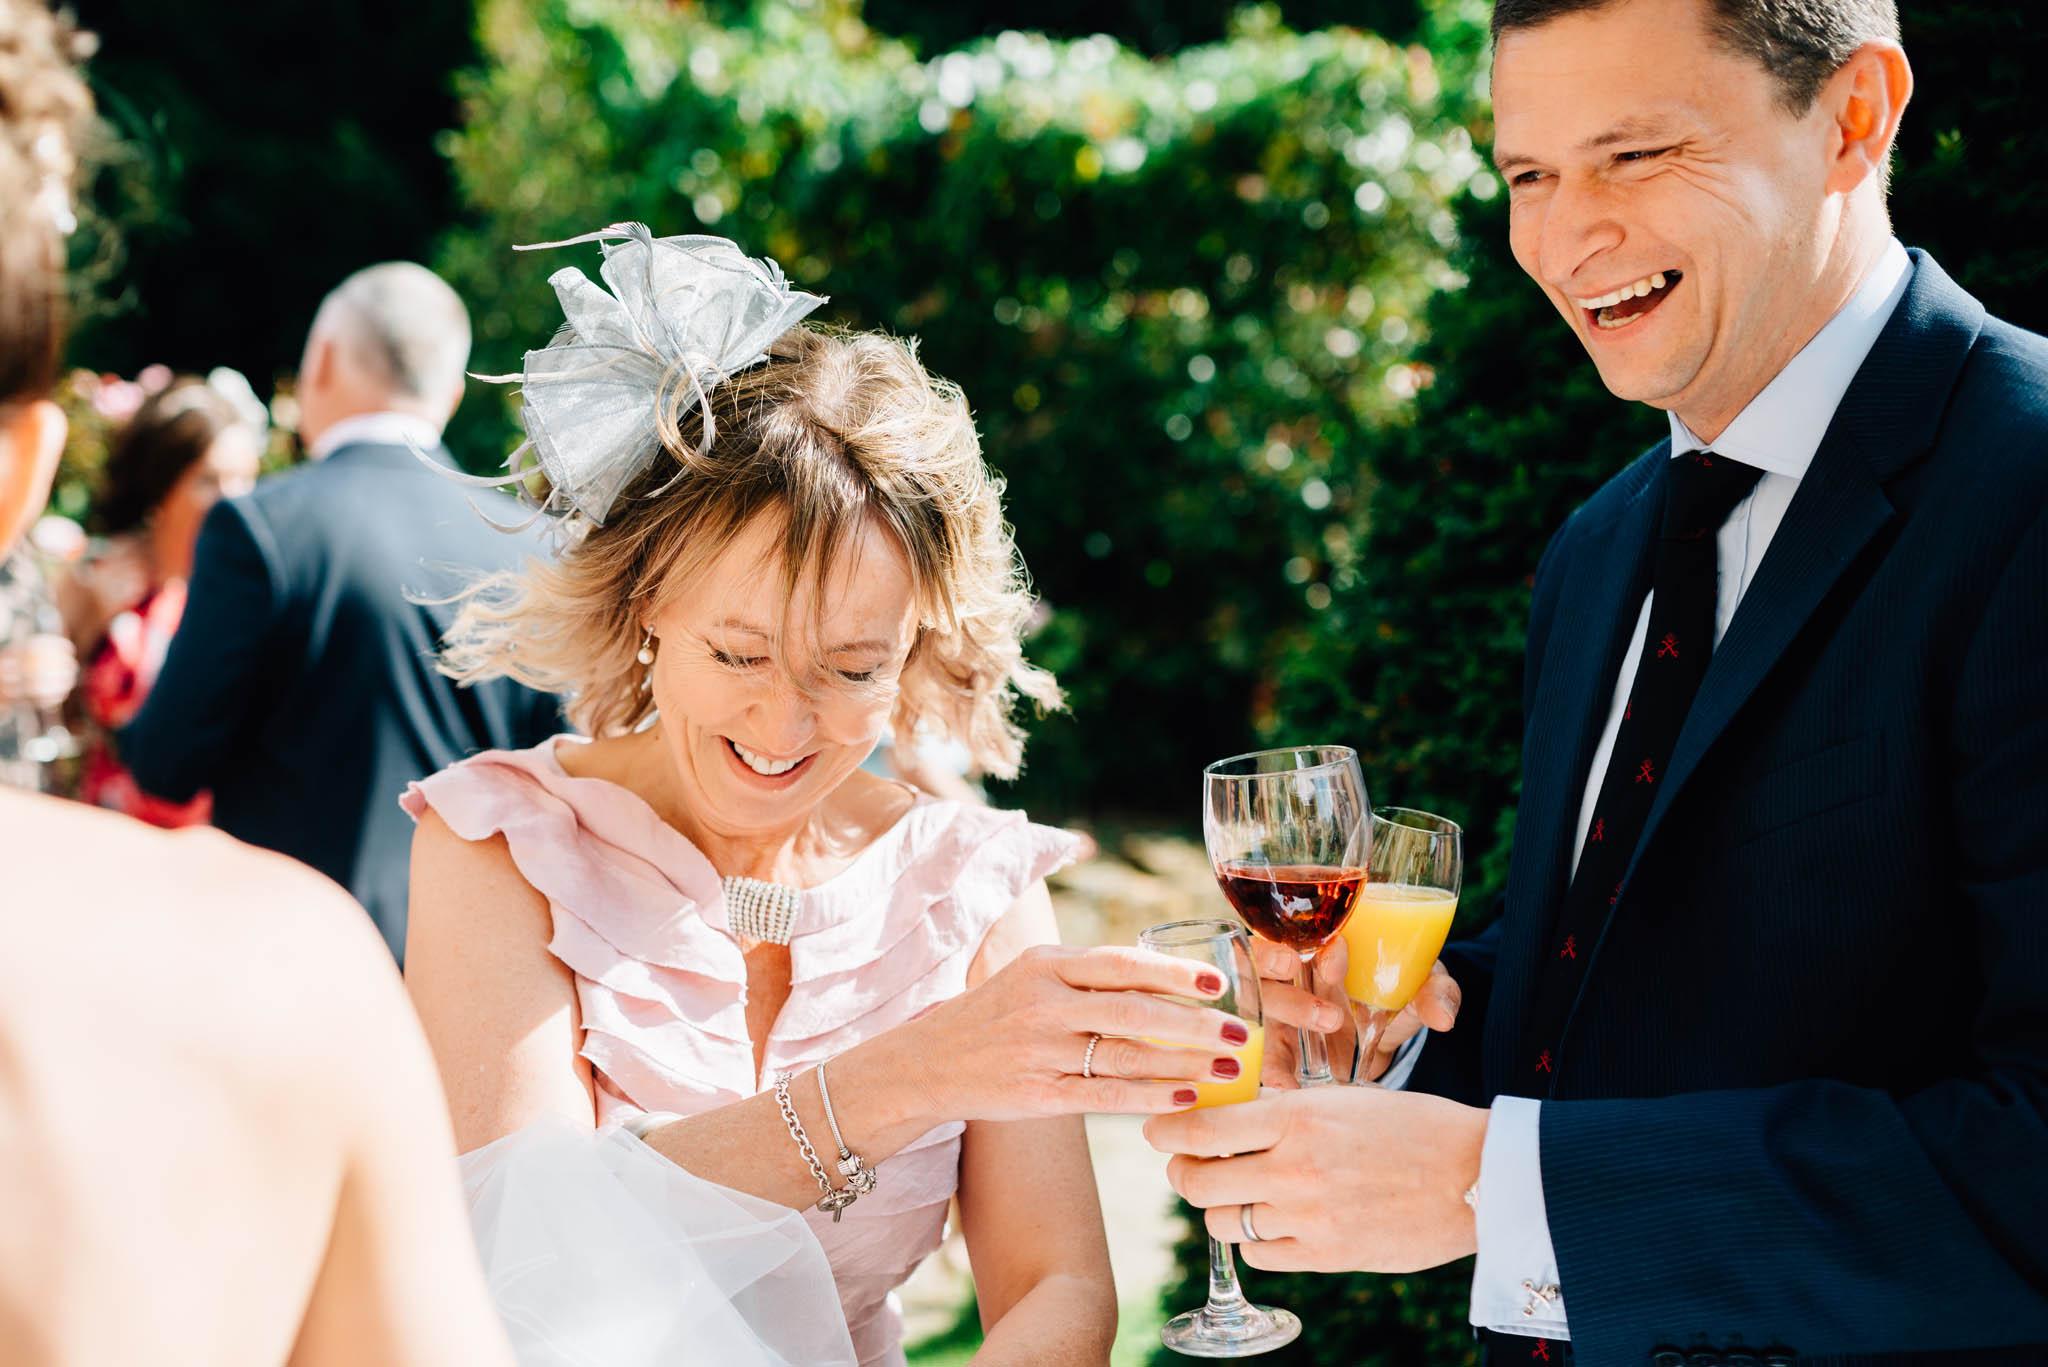 cheers-wedding-blog-scott-stockwell-photography-end-2017.jpg